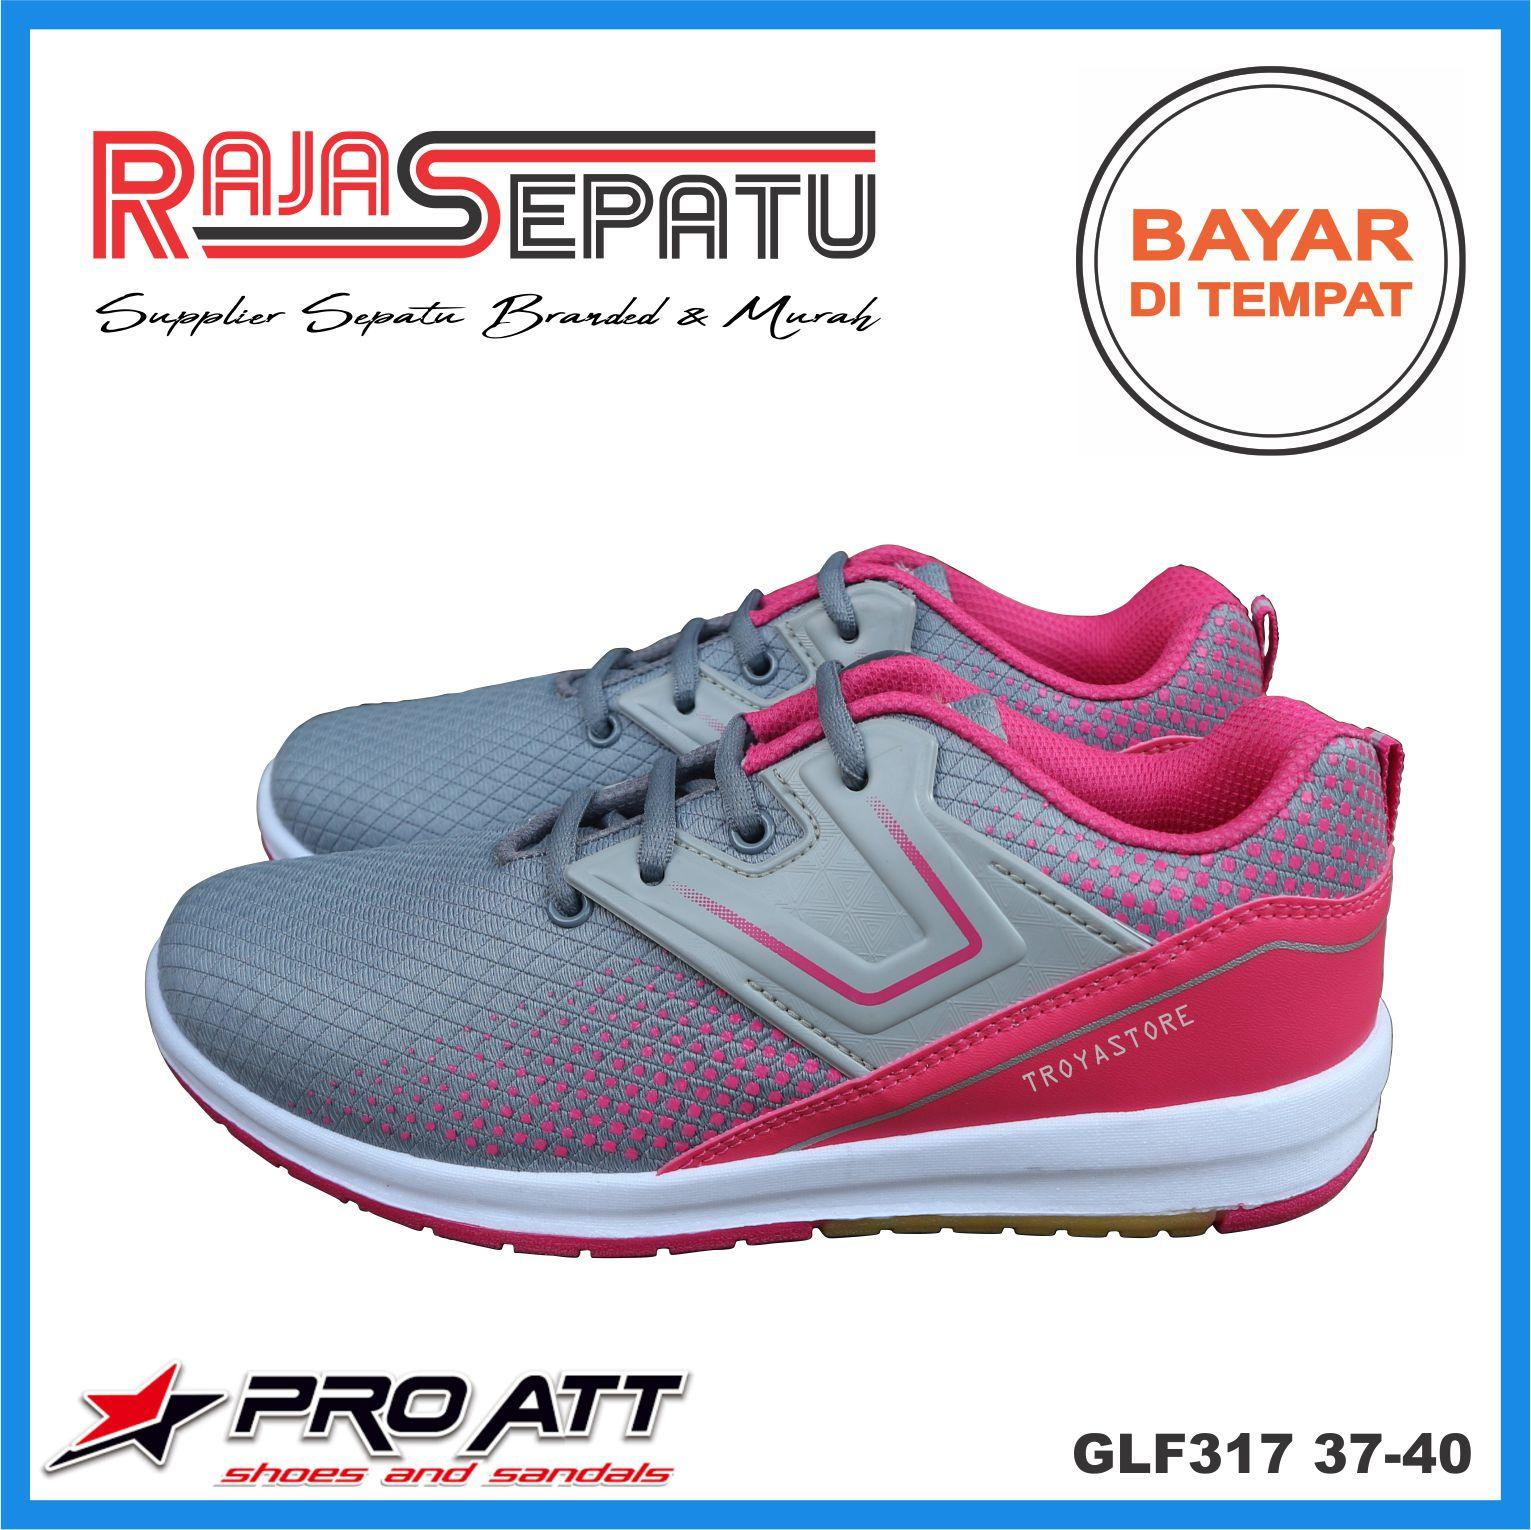 RAJASEPATU - Pro ATT Sepatu Wanita Murah GLF317 Original   Sepatu Sport  Wanita Abu Hitam Pink 52d6dddc0c